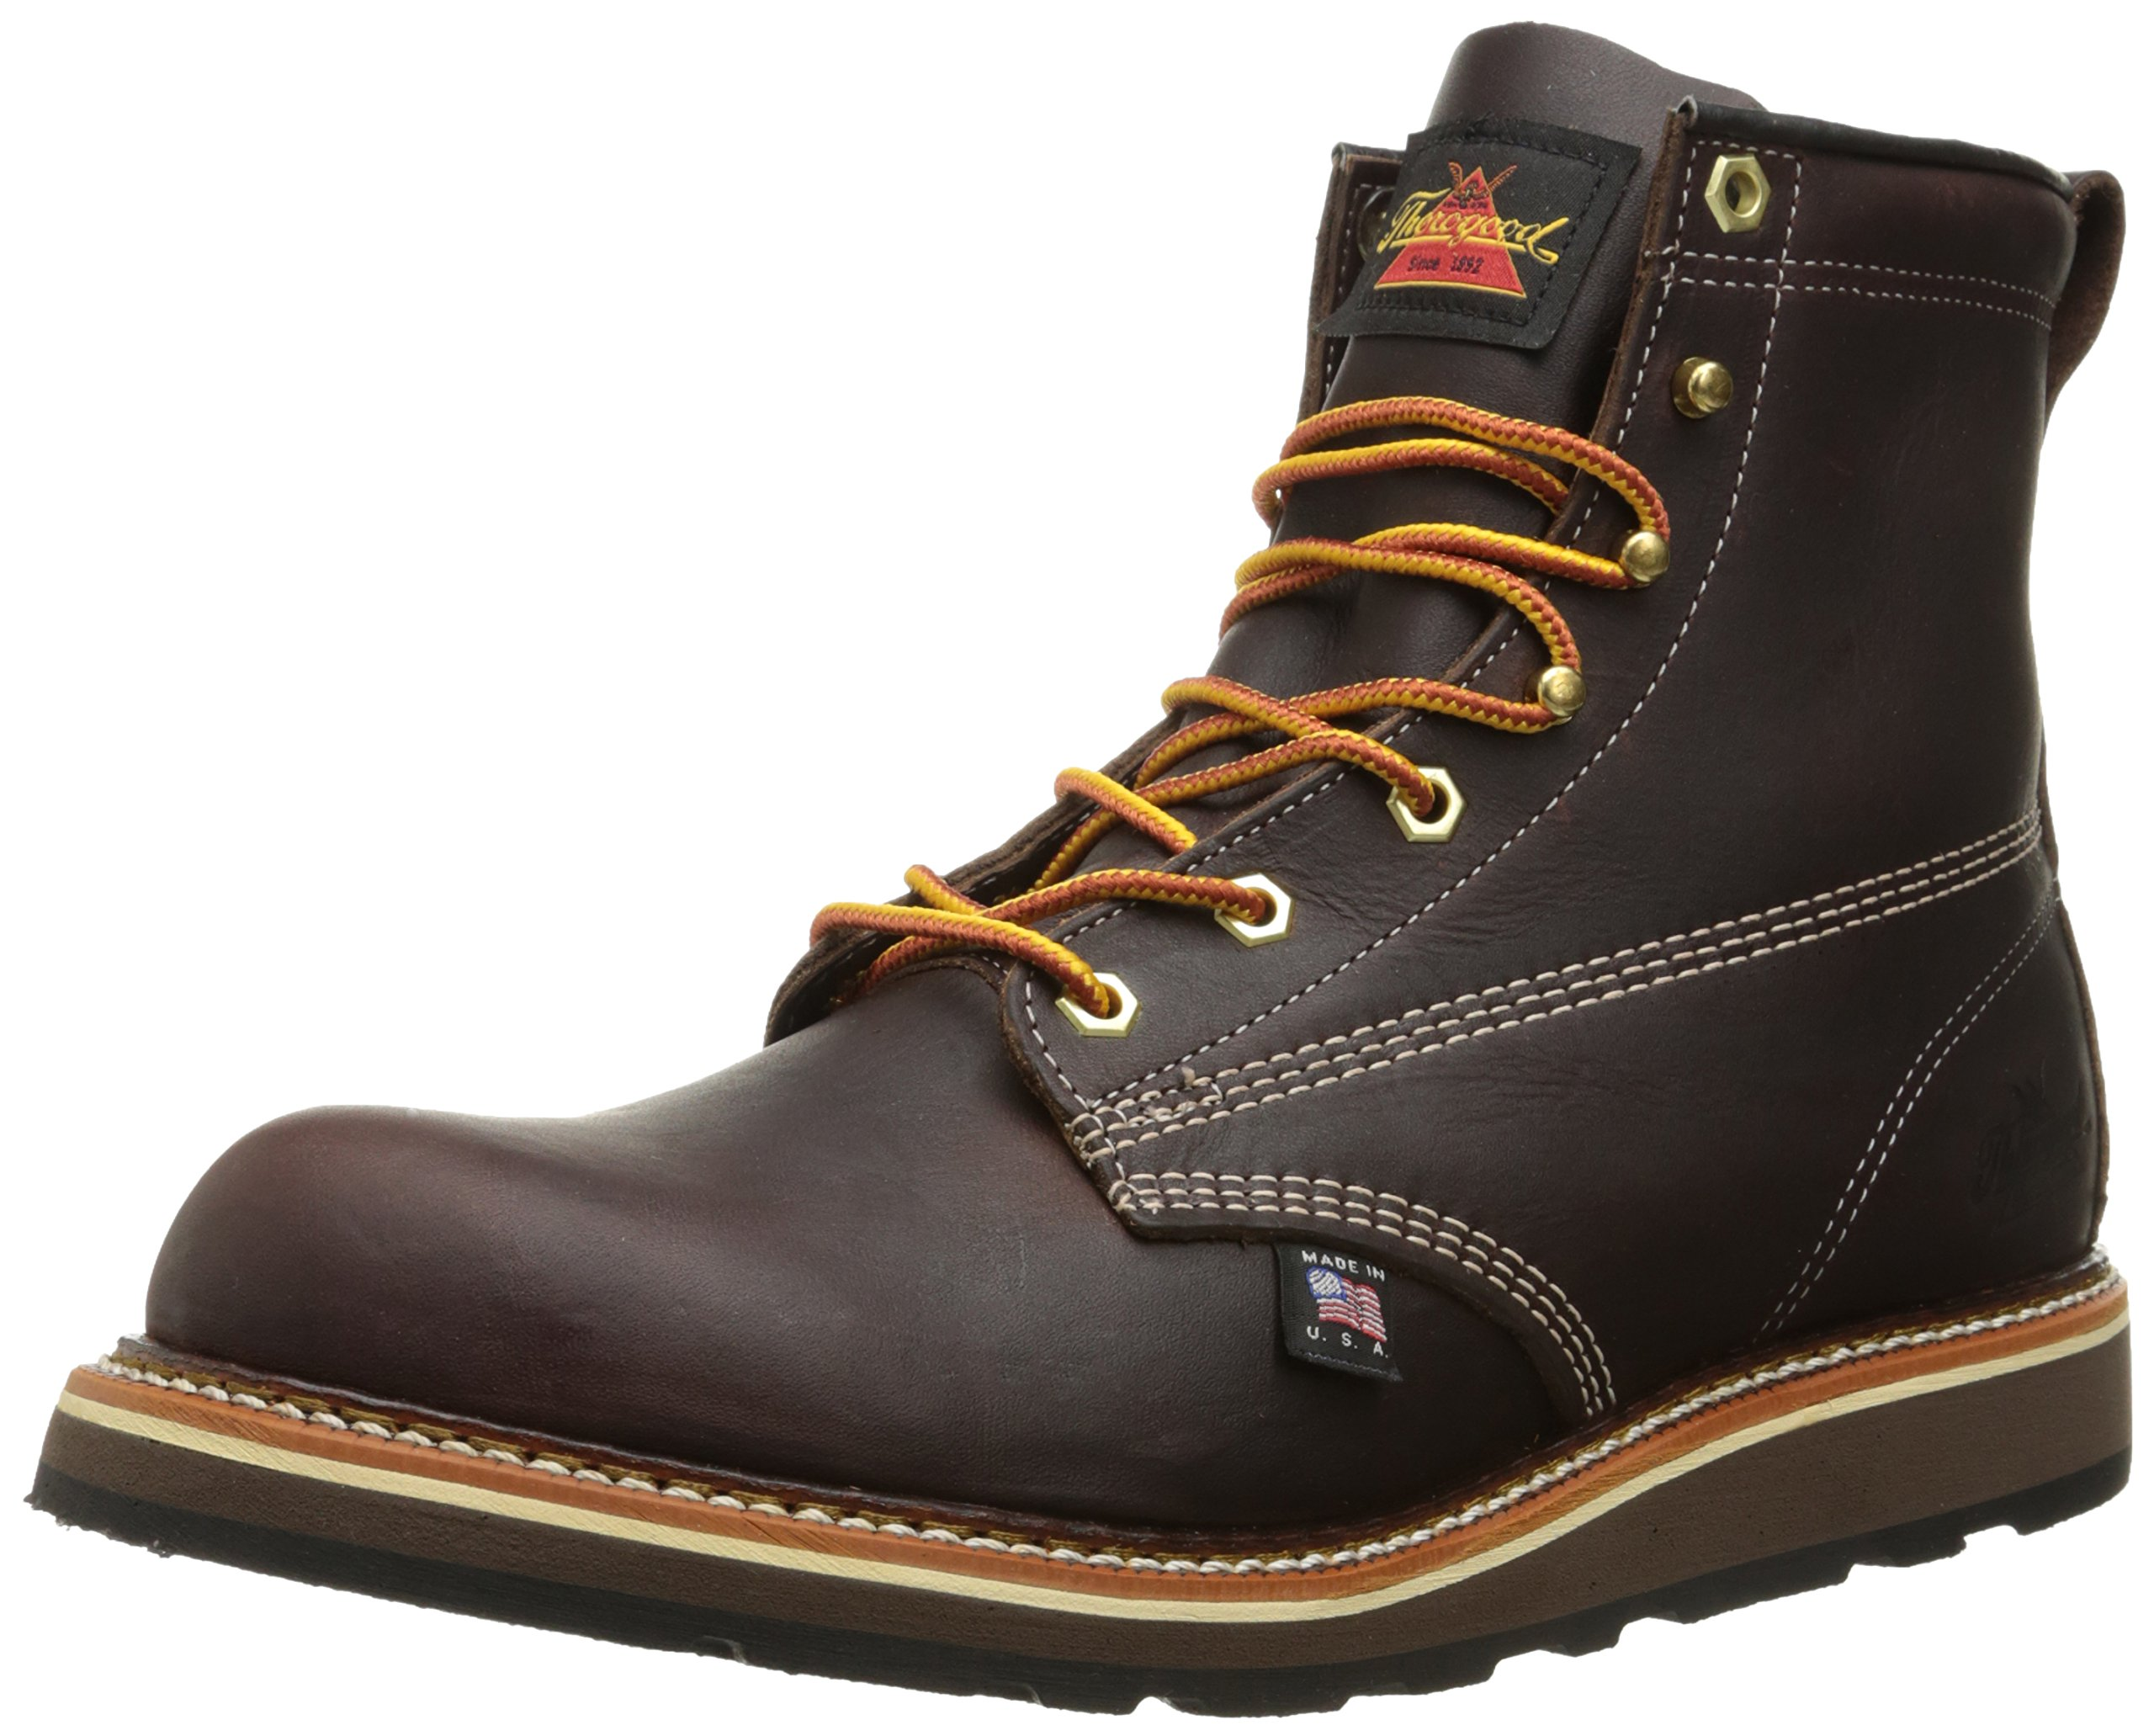 Thorogood American Heritage 6'' Plain Toe Rubber Boot, Walnut, 10.5 D US